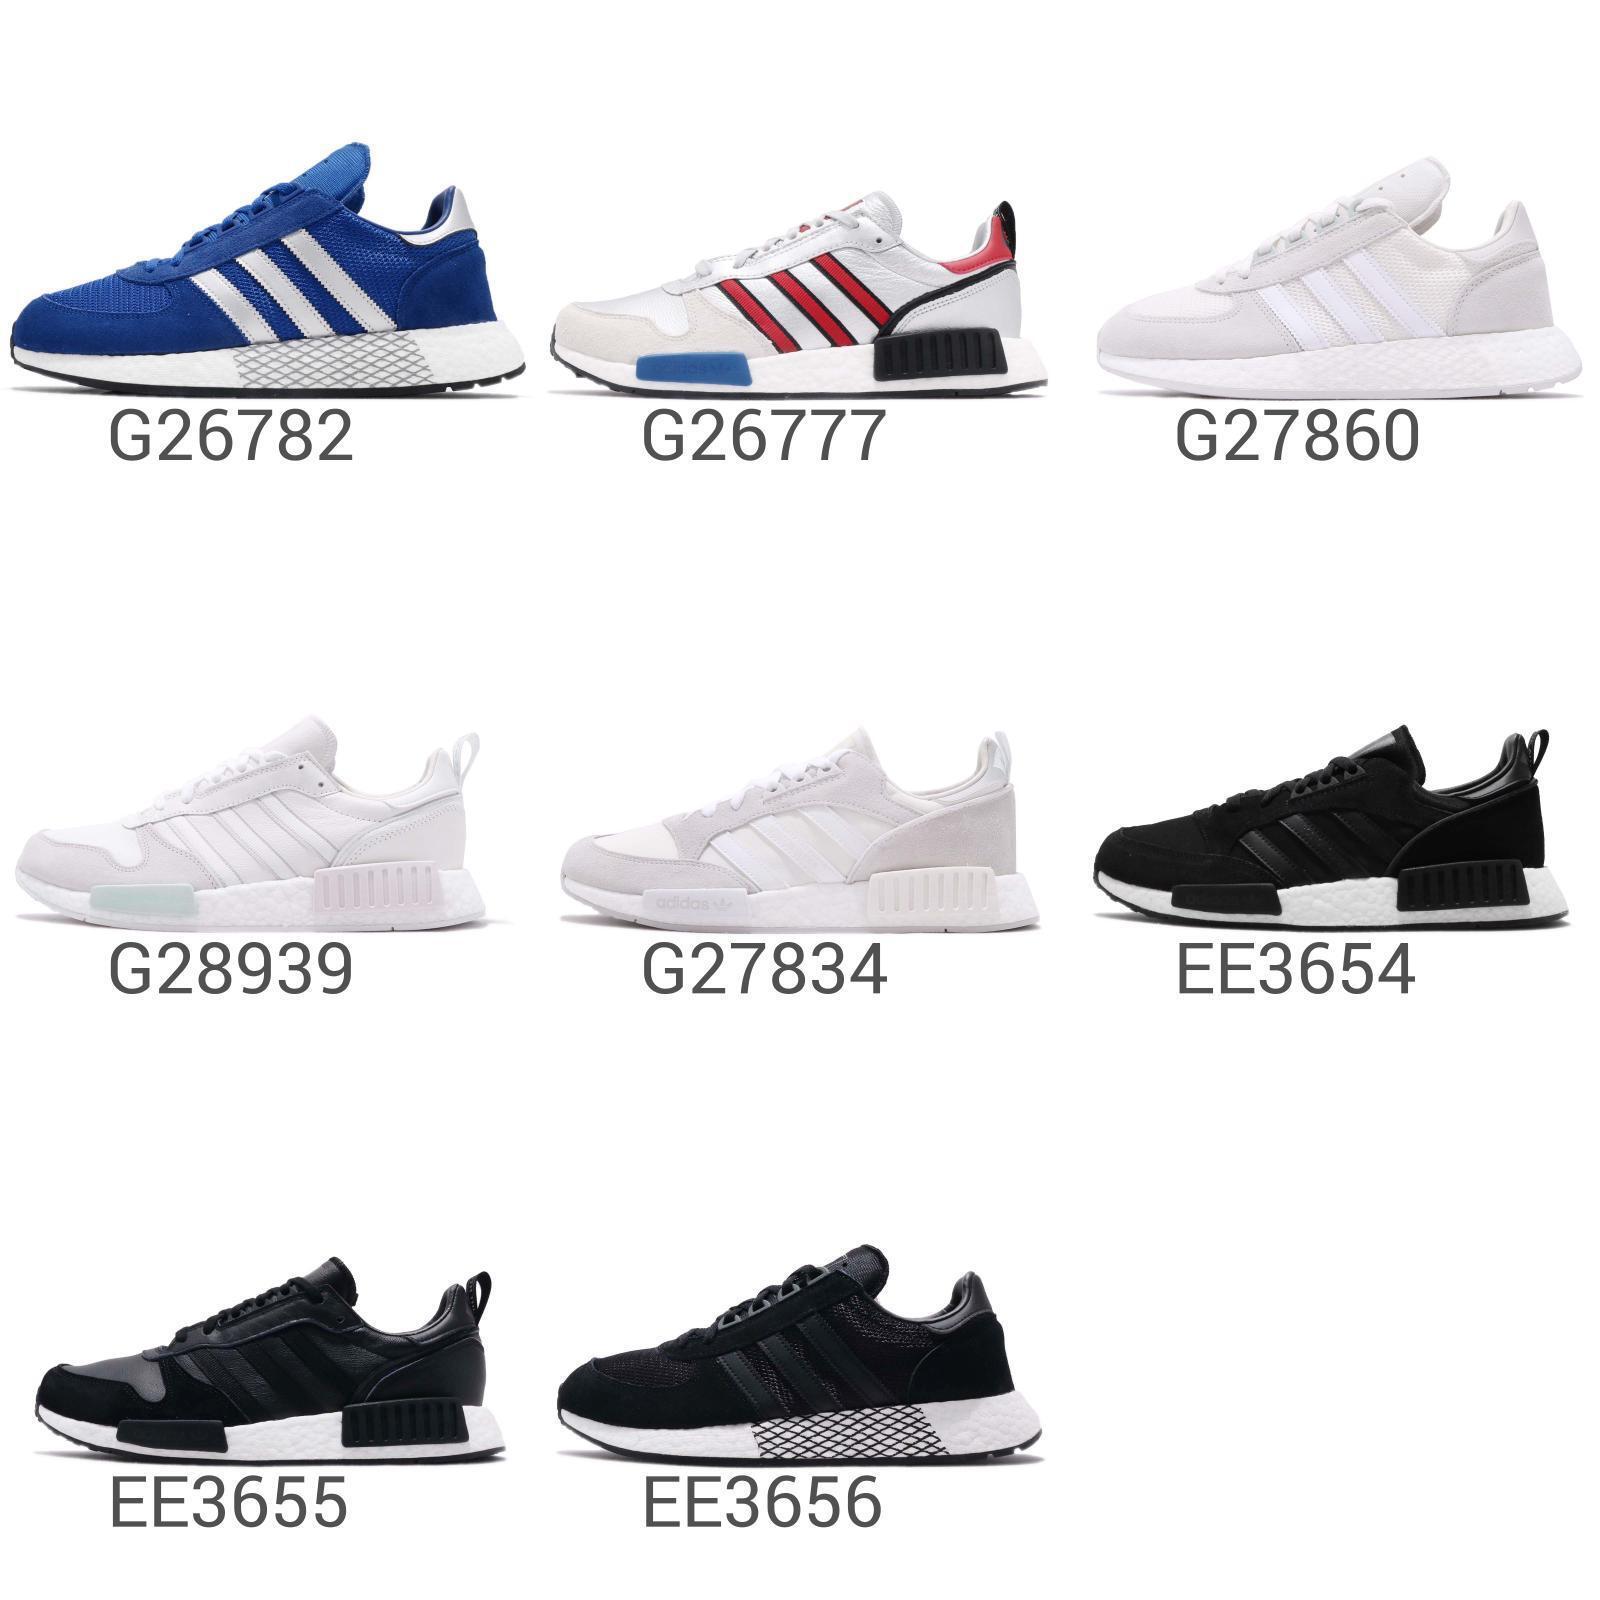 Adidas Adidas Adidas Originals nunca hizo Boost maratón Rising Star Boston Super Pick 1 2e0511